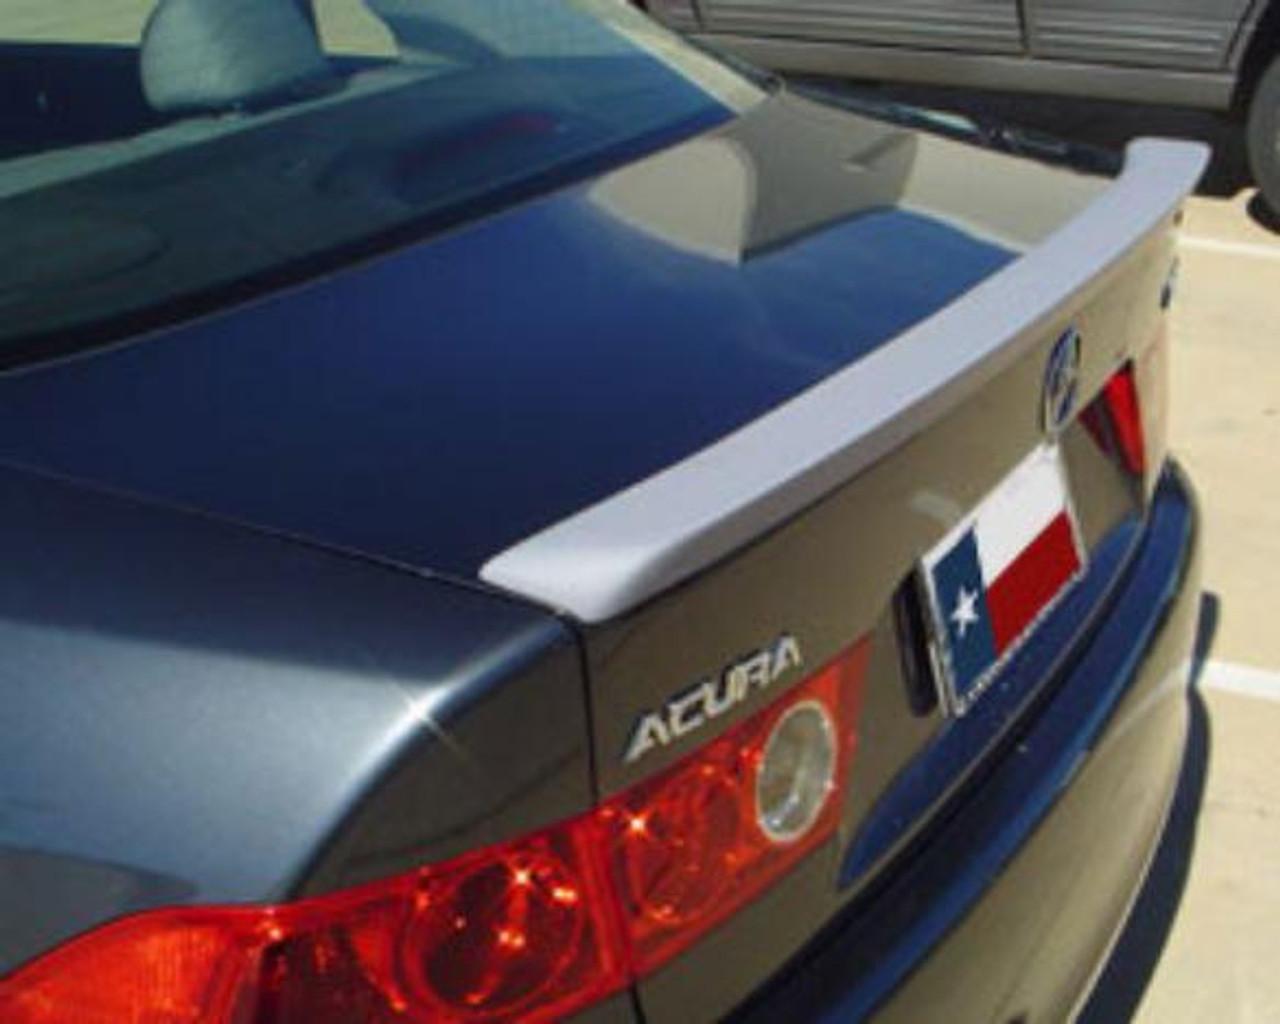 Acura Tsx 2003 2008 Custom Lip No Light Rear Trunk Spoiler 707 Motoring Auto Parts Accessories